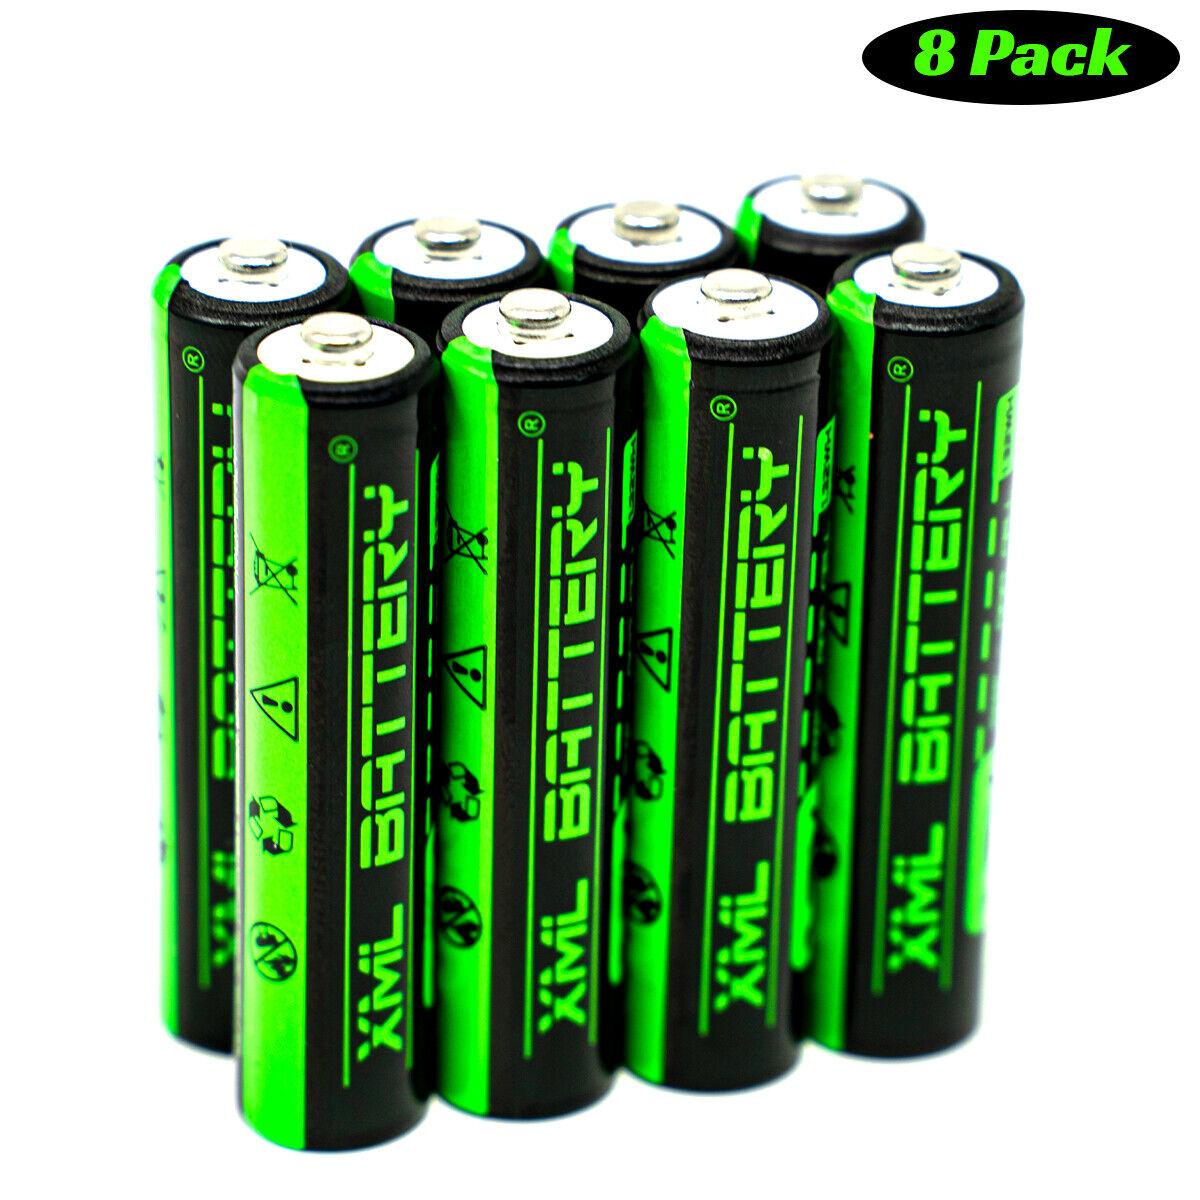 (8 Pack) 1.2v 1100mAh NI-MH Battery for Multi-use General Purpose Security